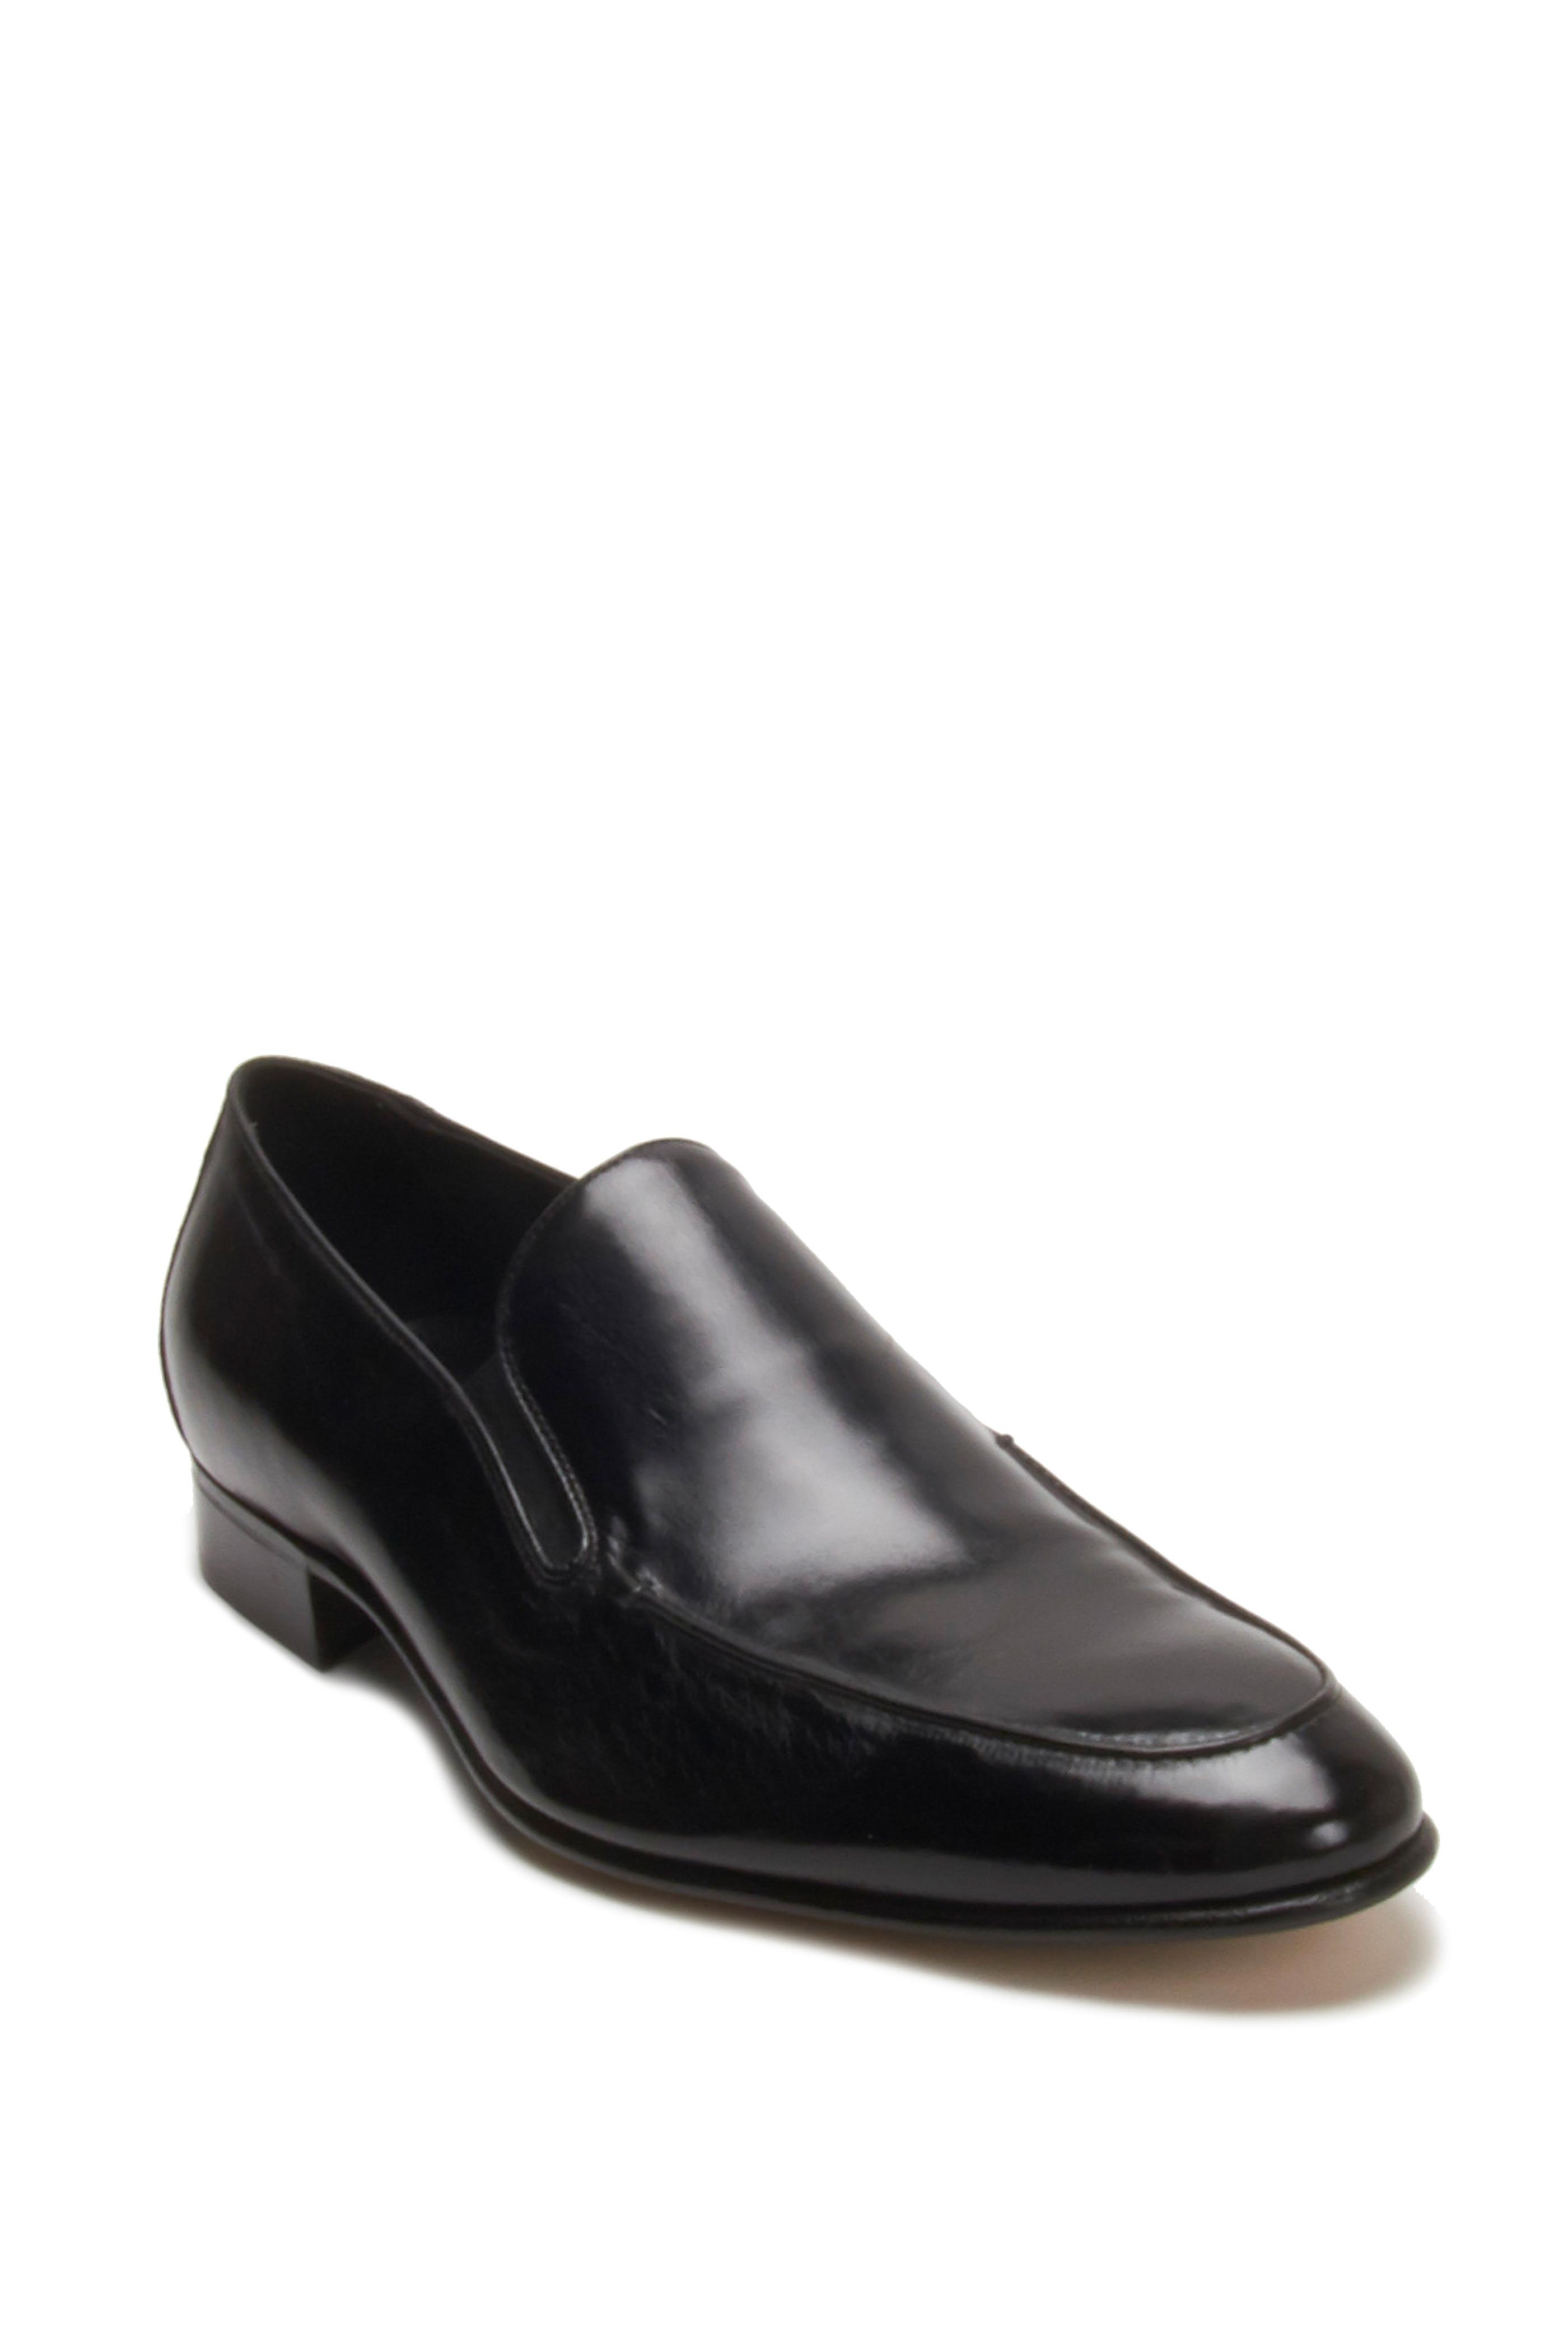 Gravati Black Leather Slip On Loafer | Mitchell Stores